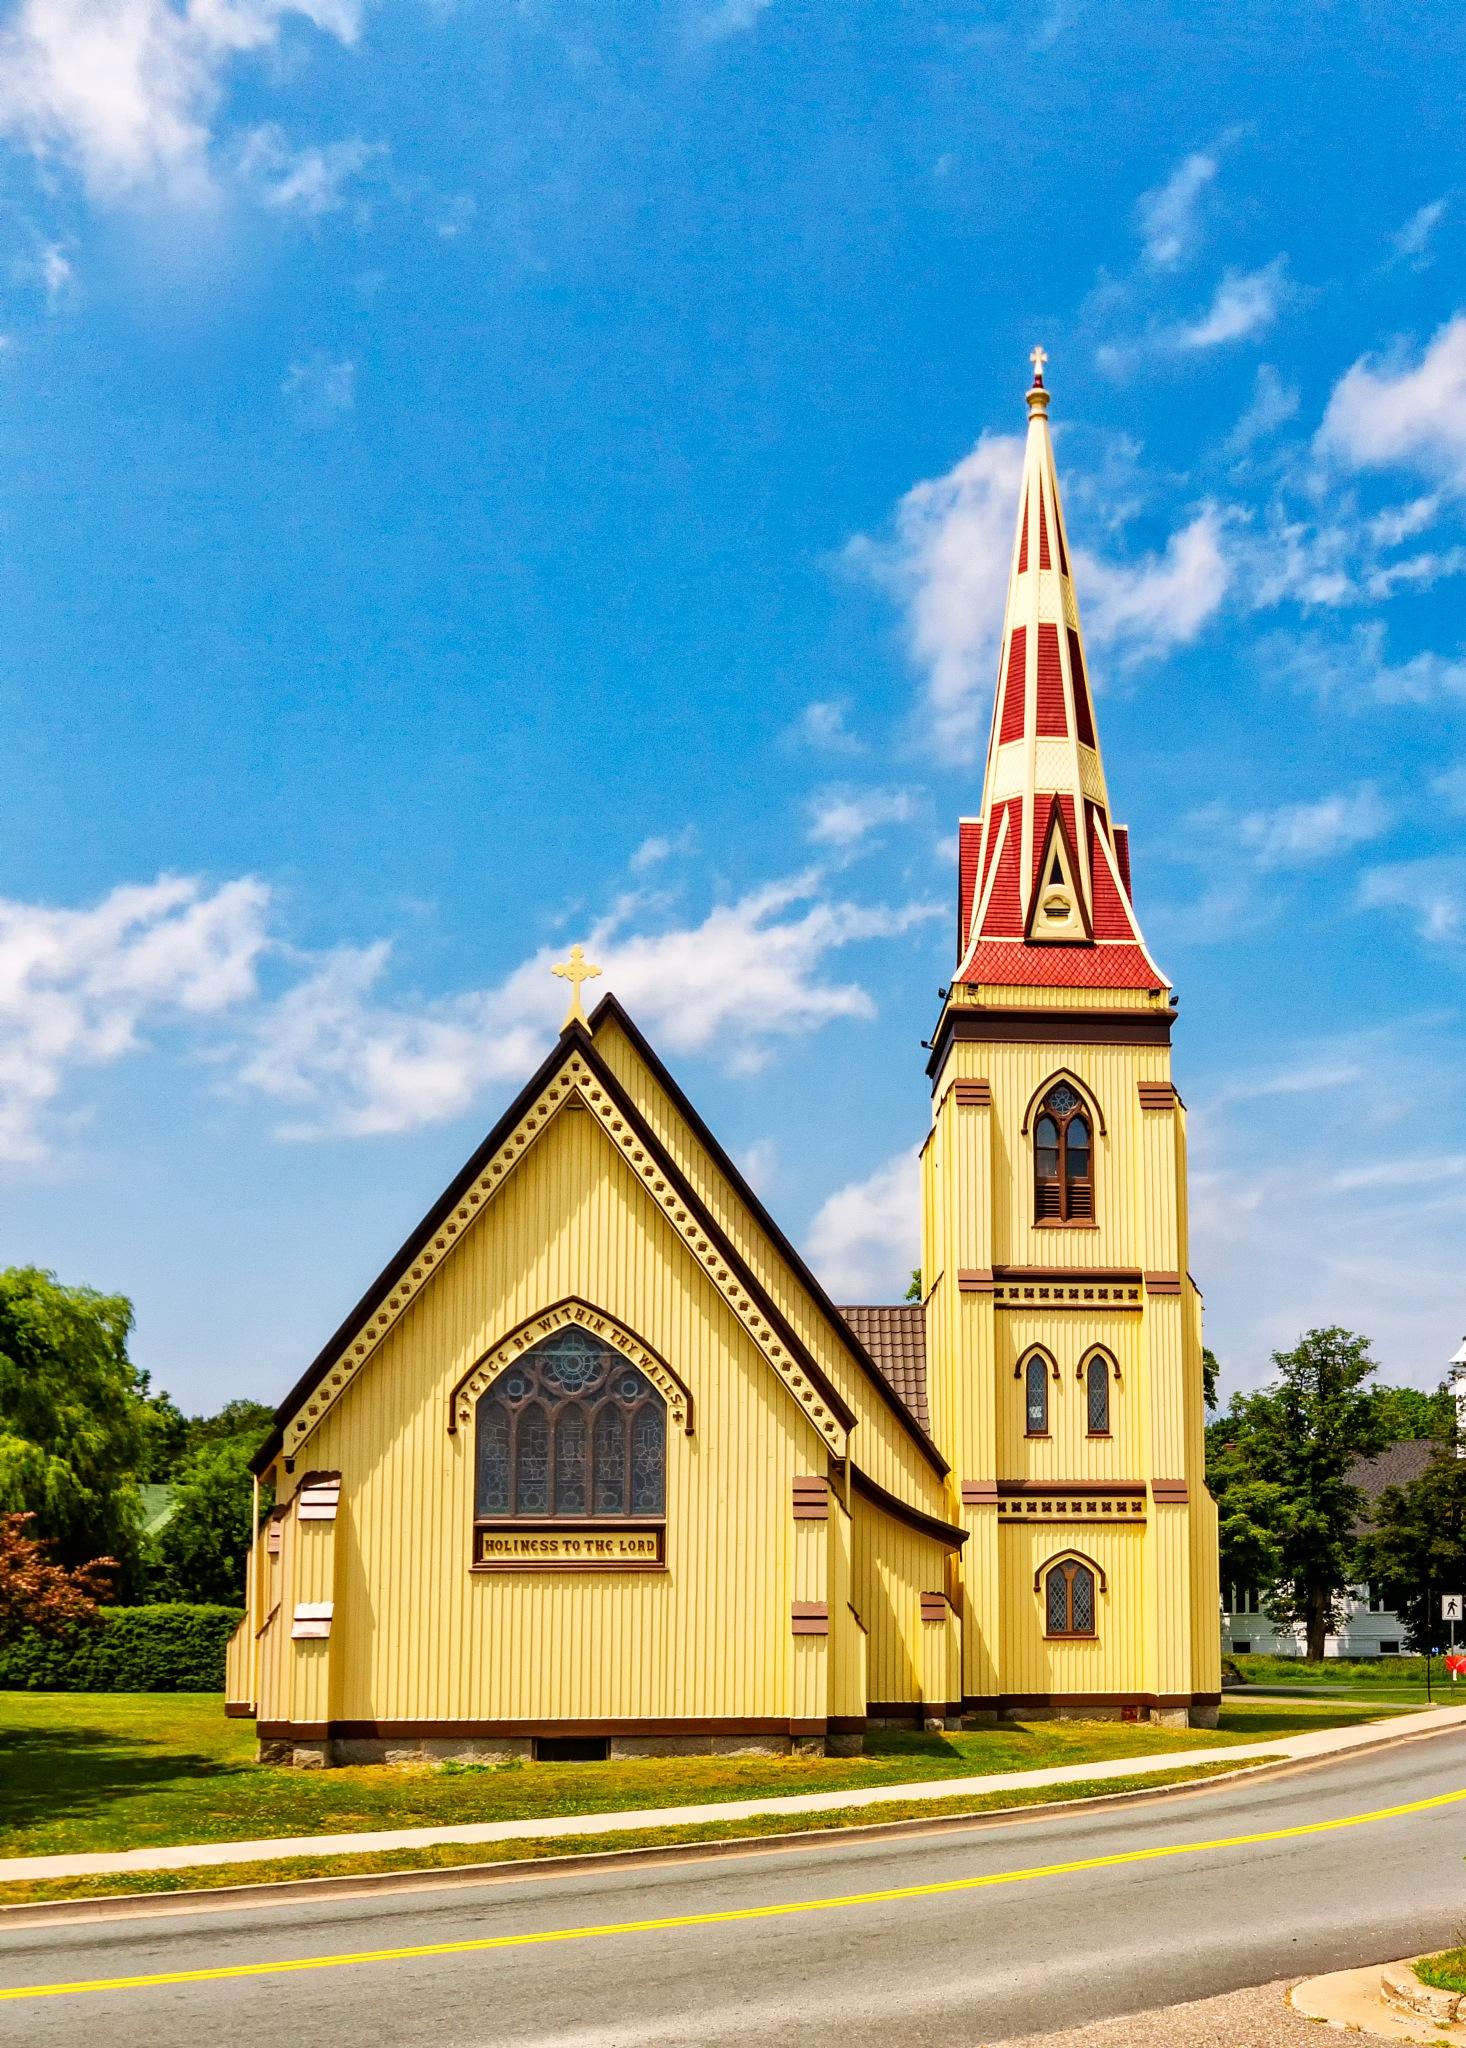 Church by Joe Chrvala